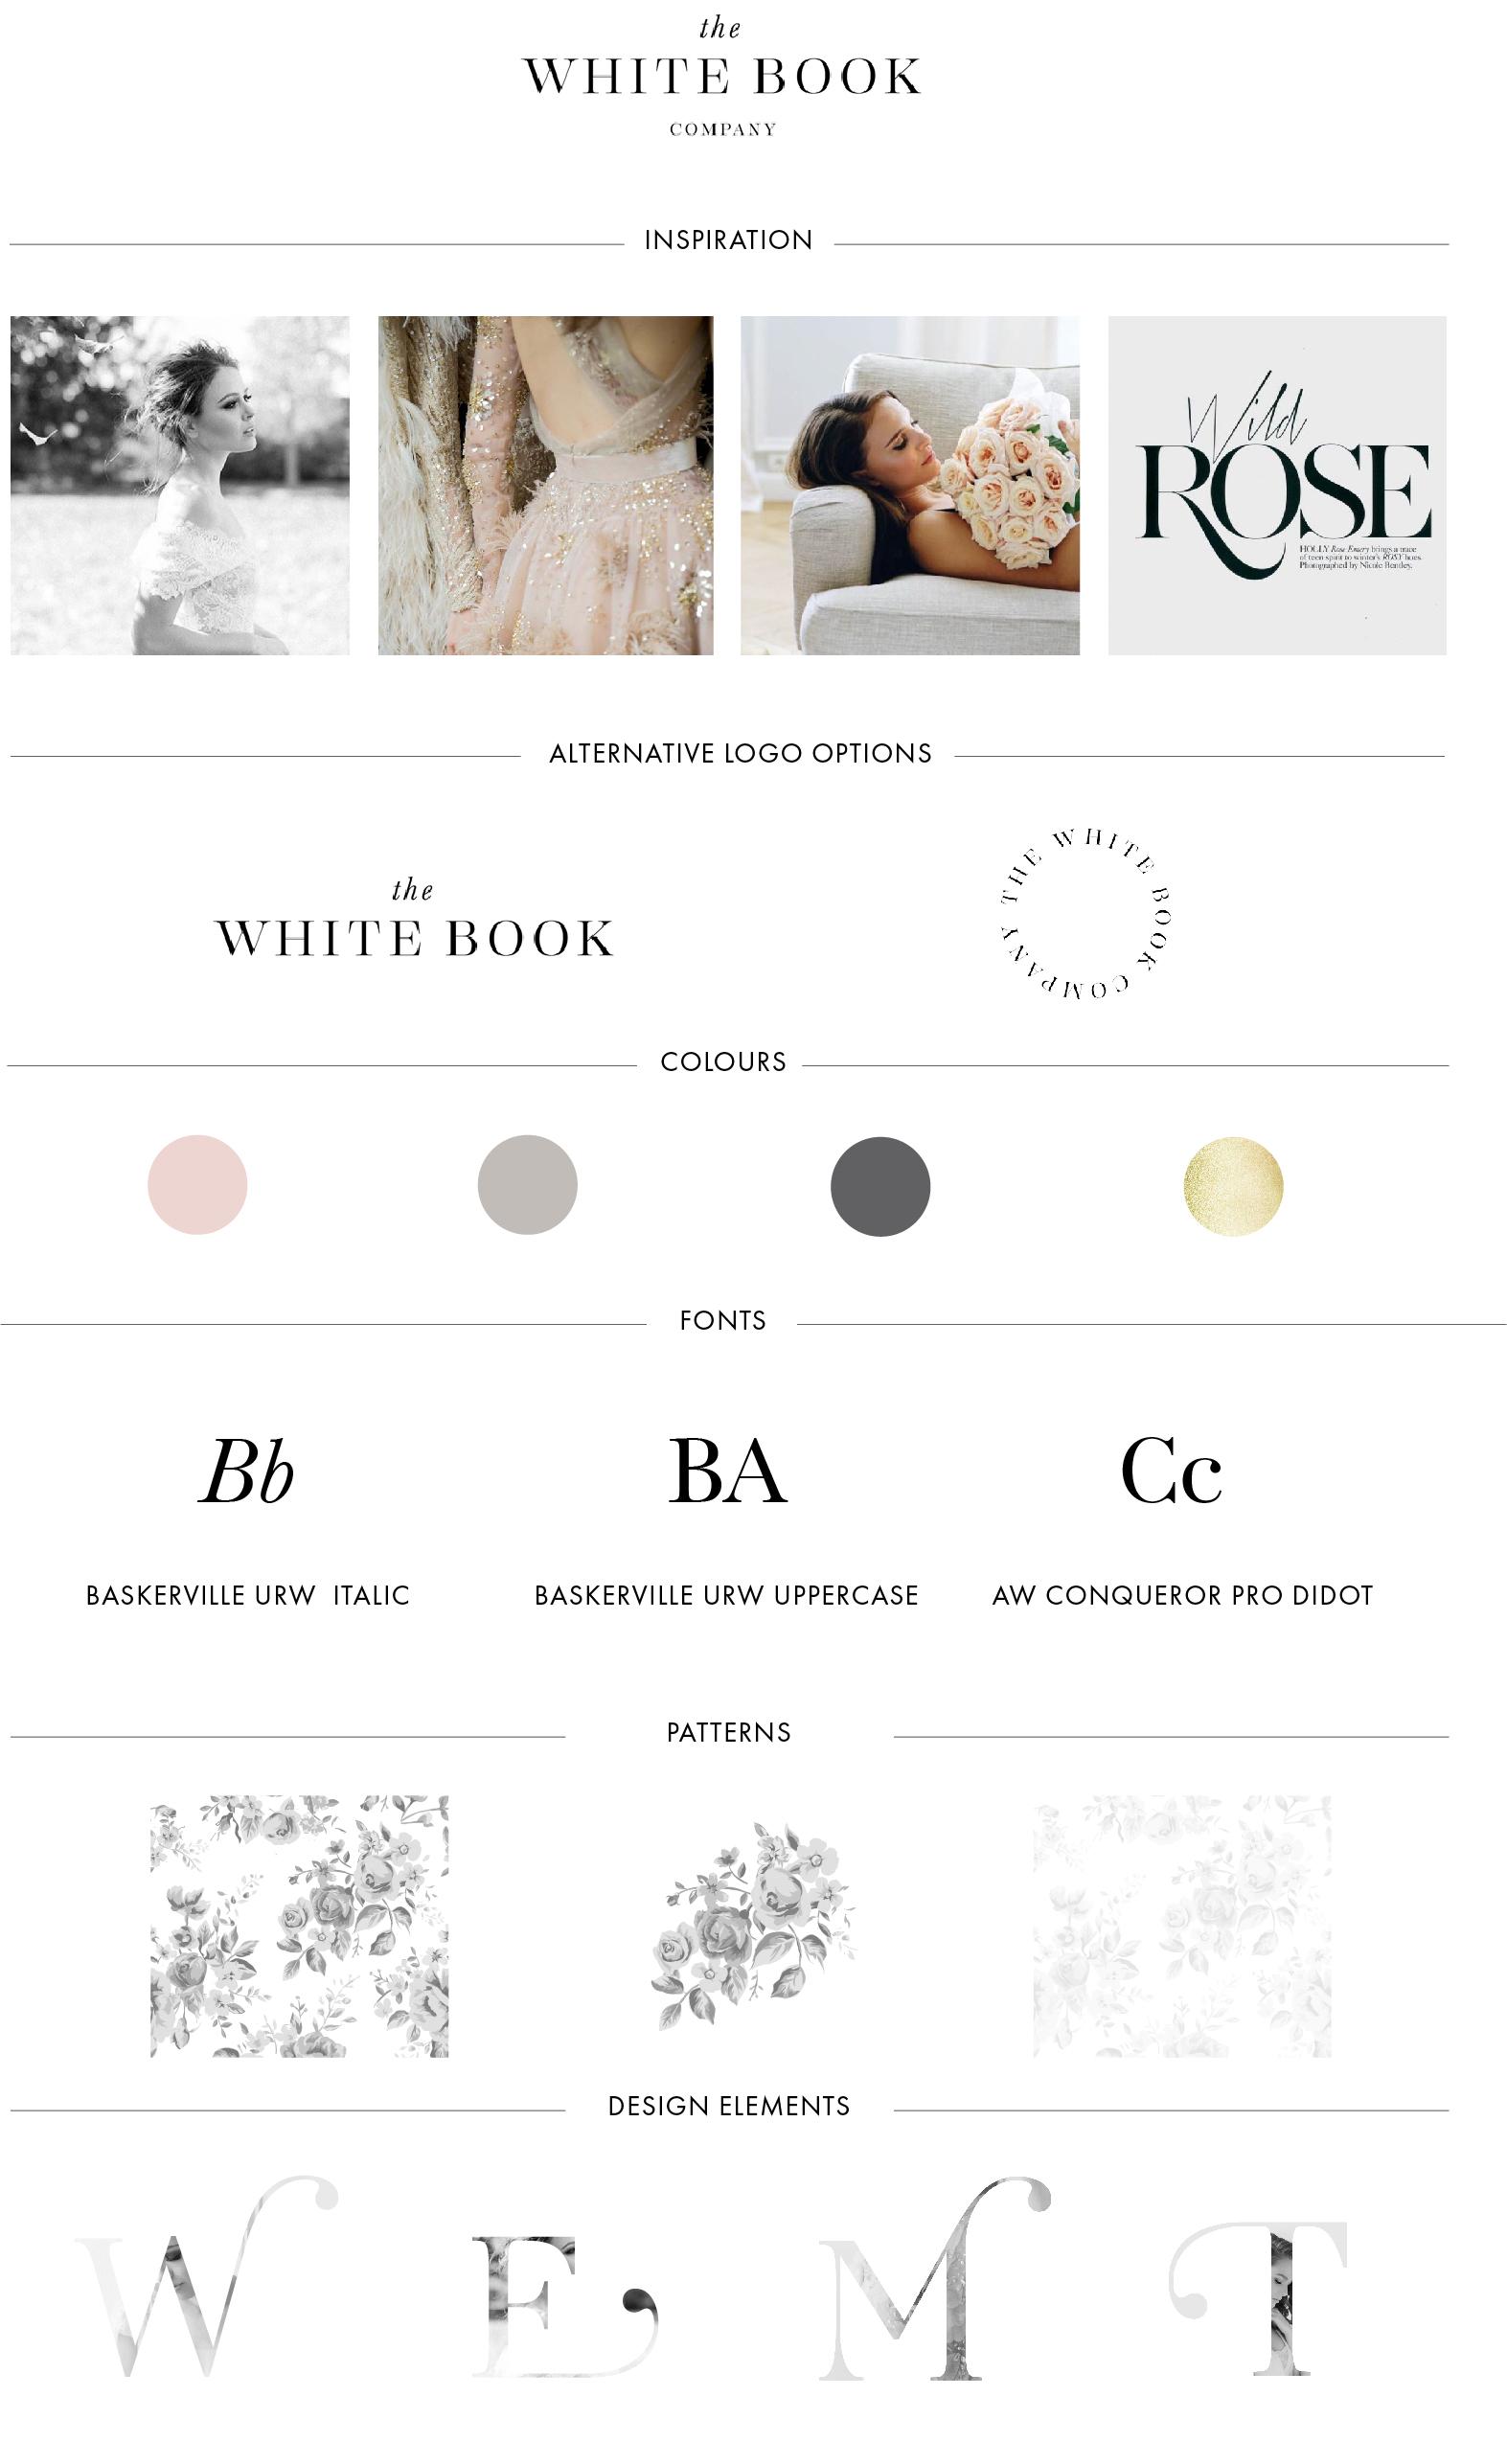 WhiteBookCo__BrandStyleBoard.jpg